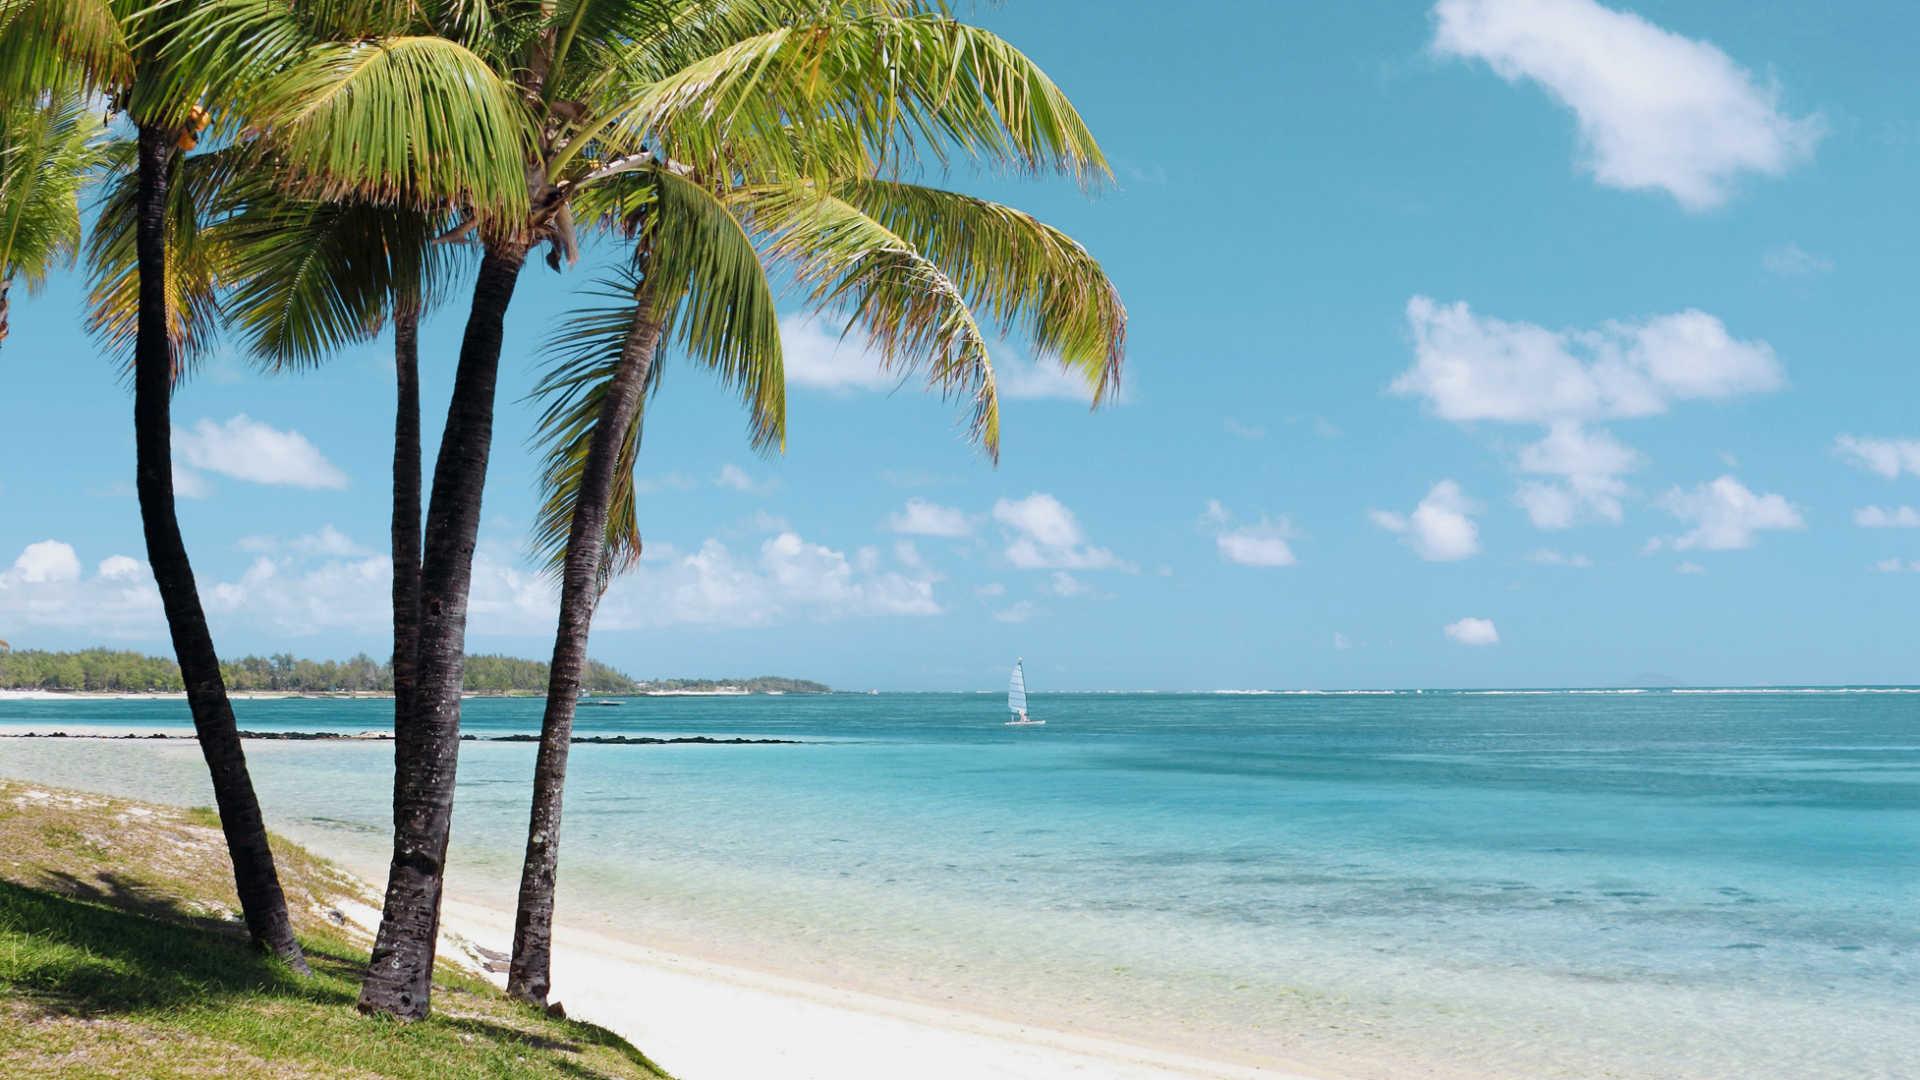 http://cegepsherbrooke.qc.ca/sites/default/files/field/image/solana-beach.jpg